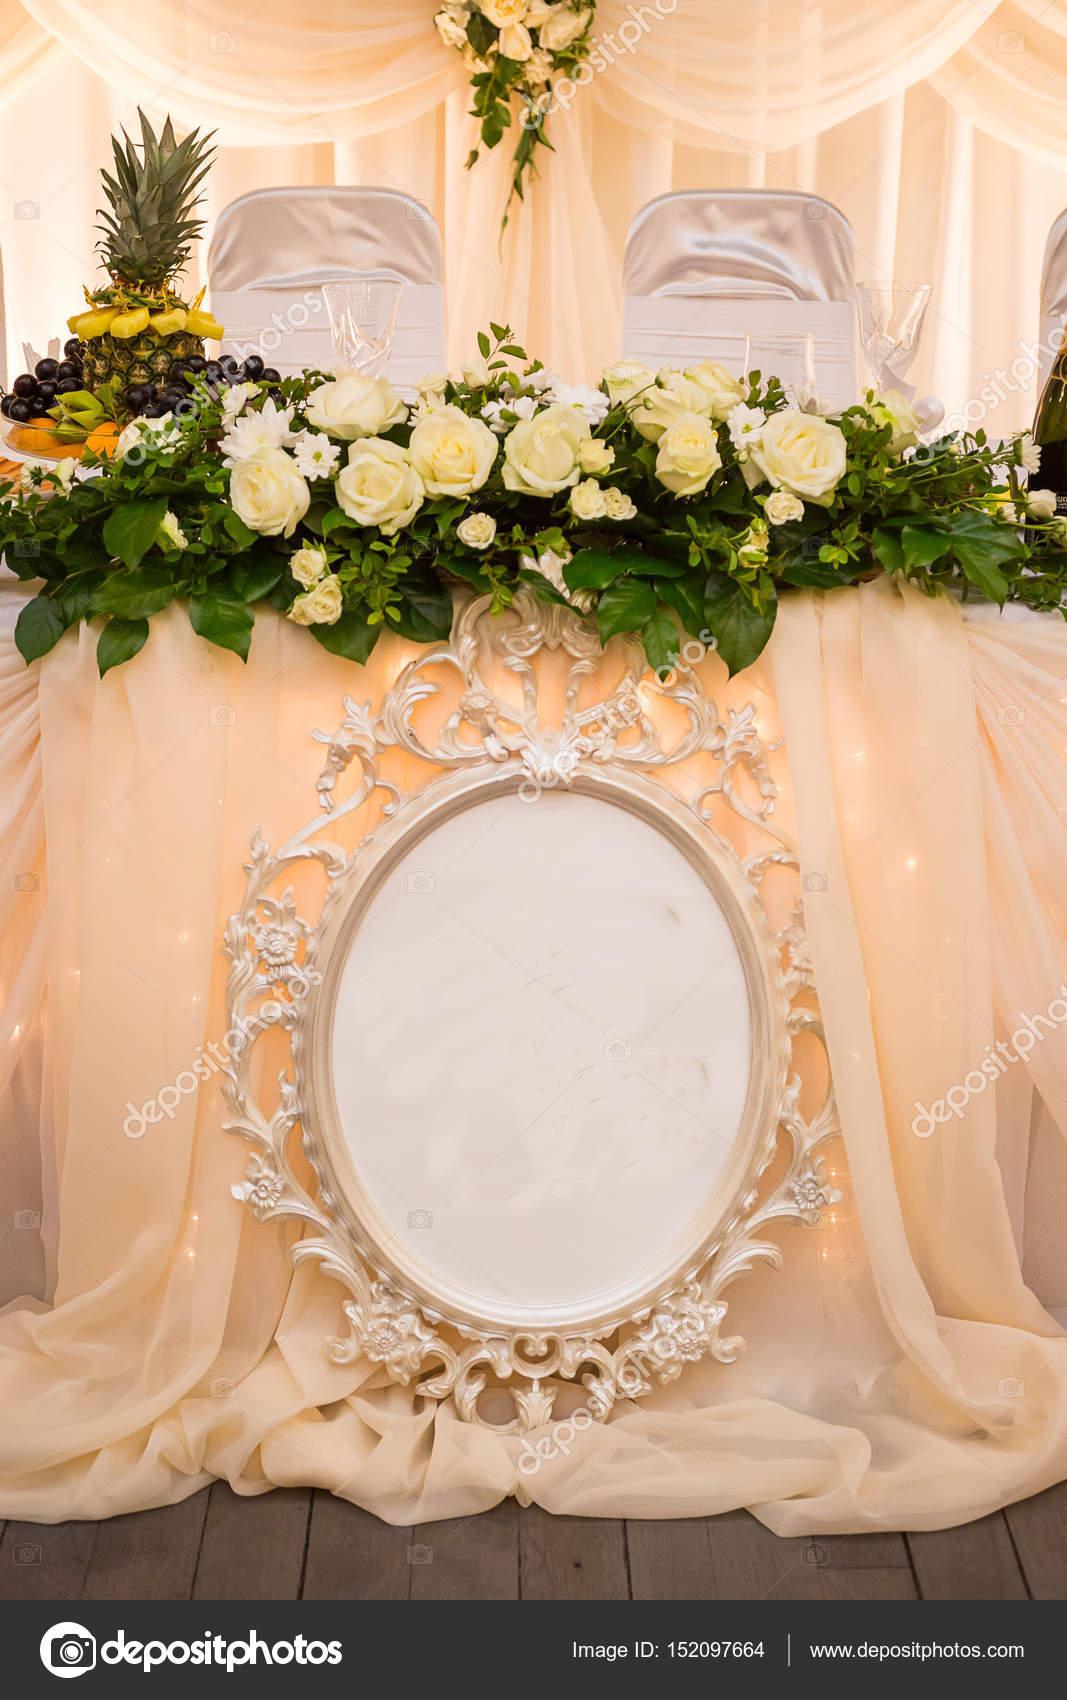 3feed4a6e93f Τις ρυθμίσεις τραπέζι γάμου. Τραπέζι που διακοσμημένα με Ανθοσυνθέσεις γάμου